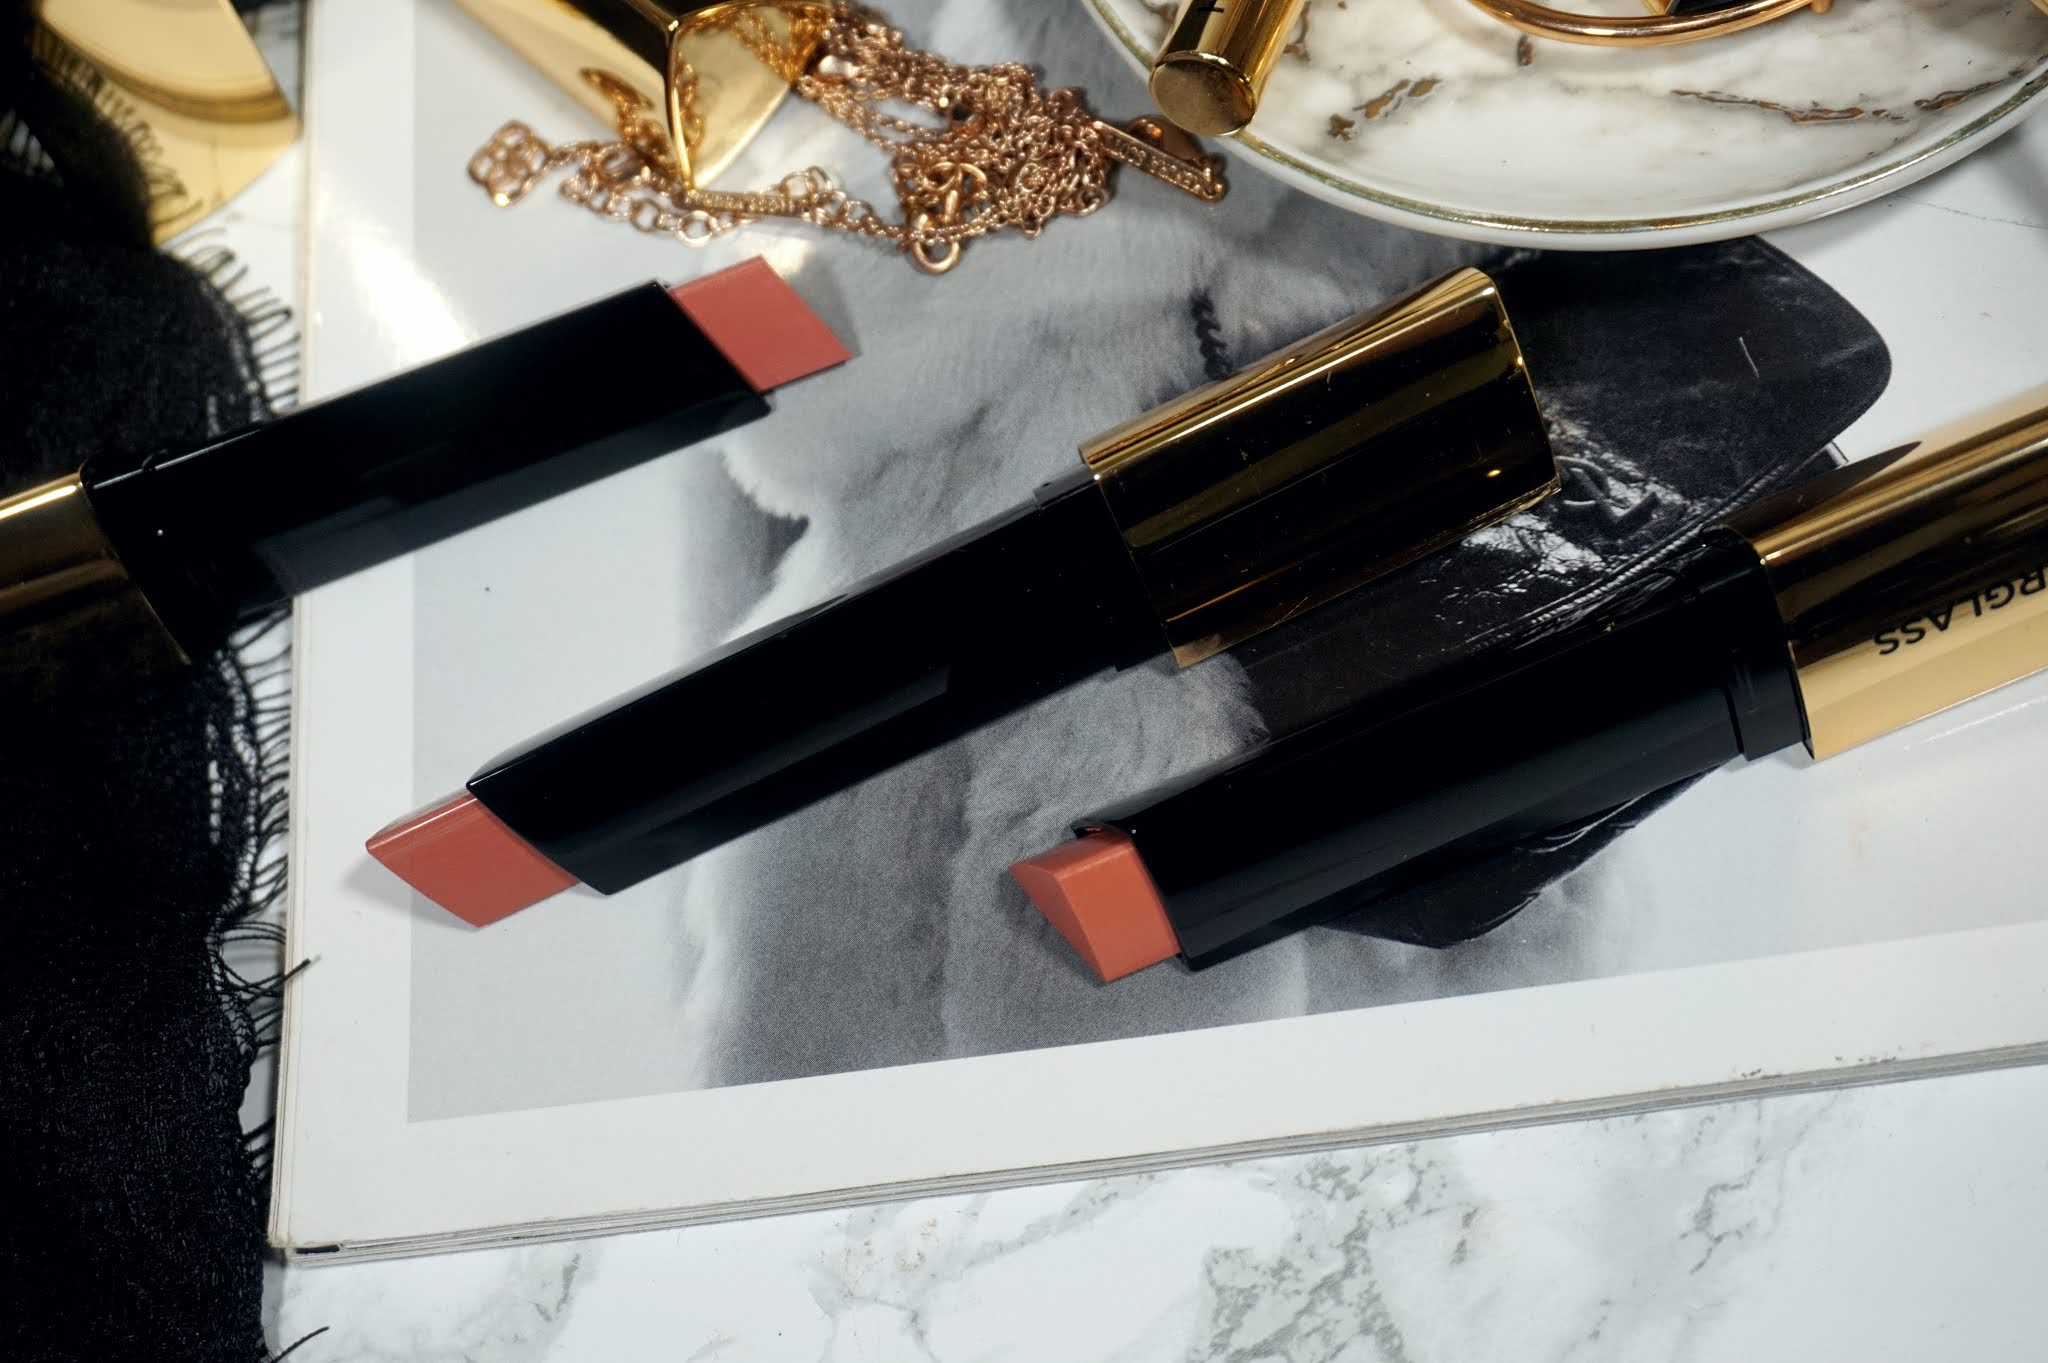 Hourglass Vanish Blush Stick Review and Swatches